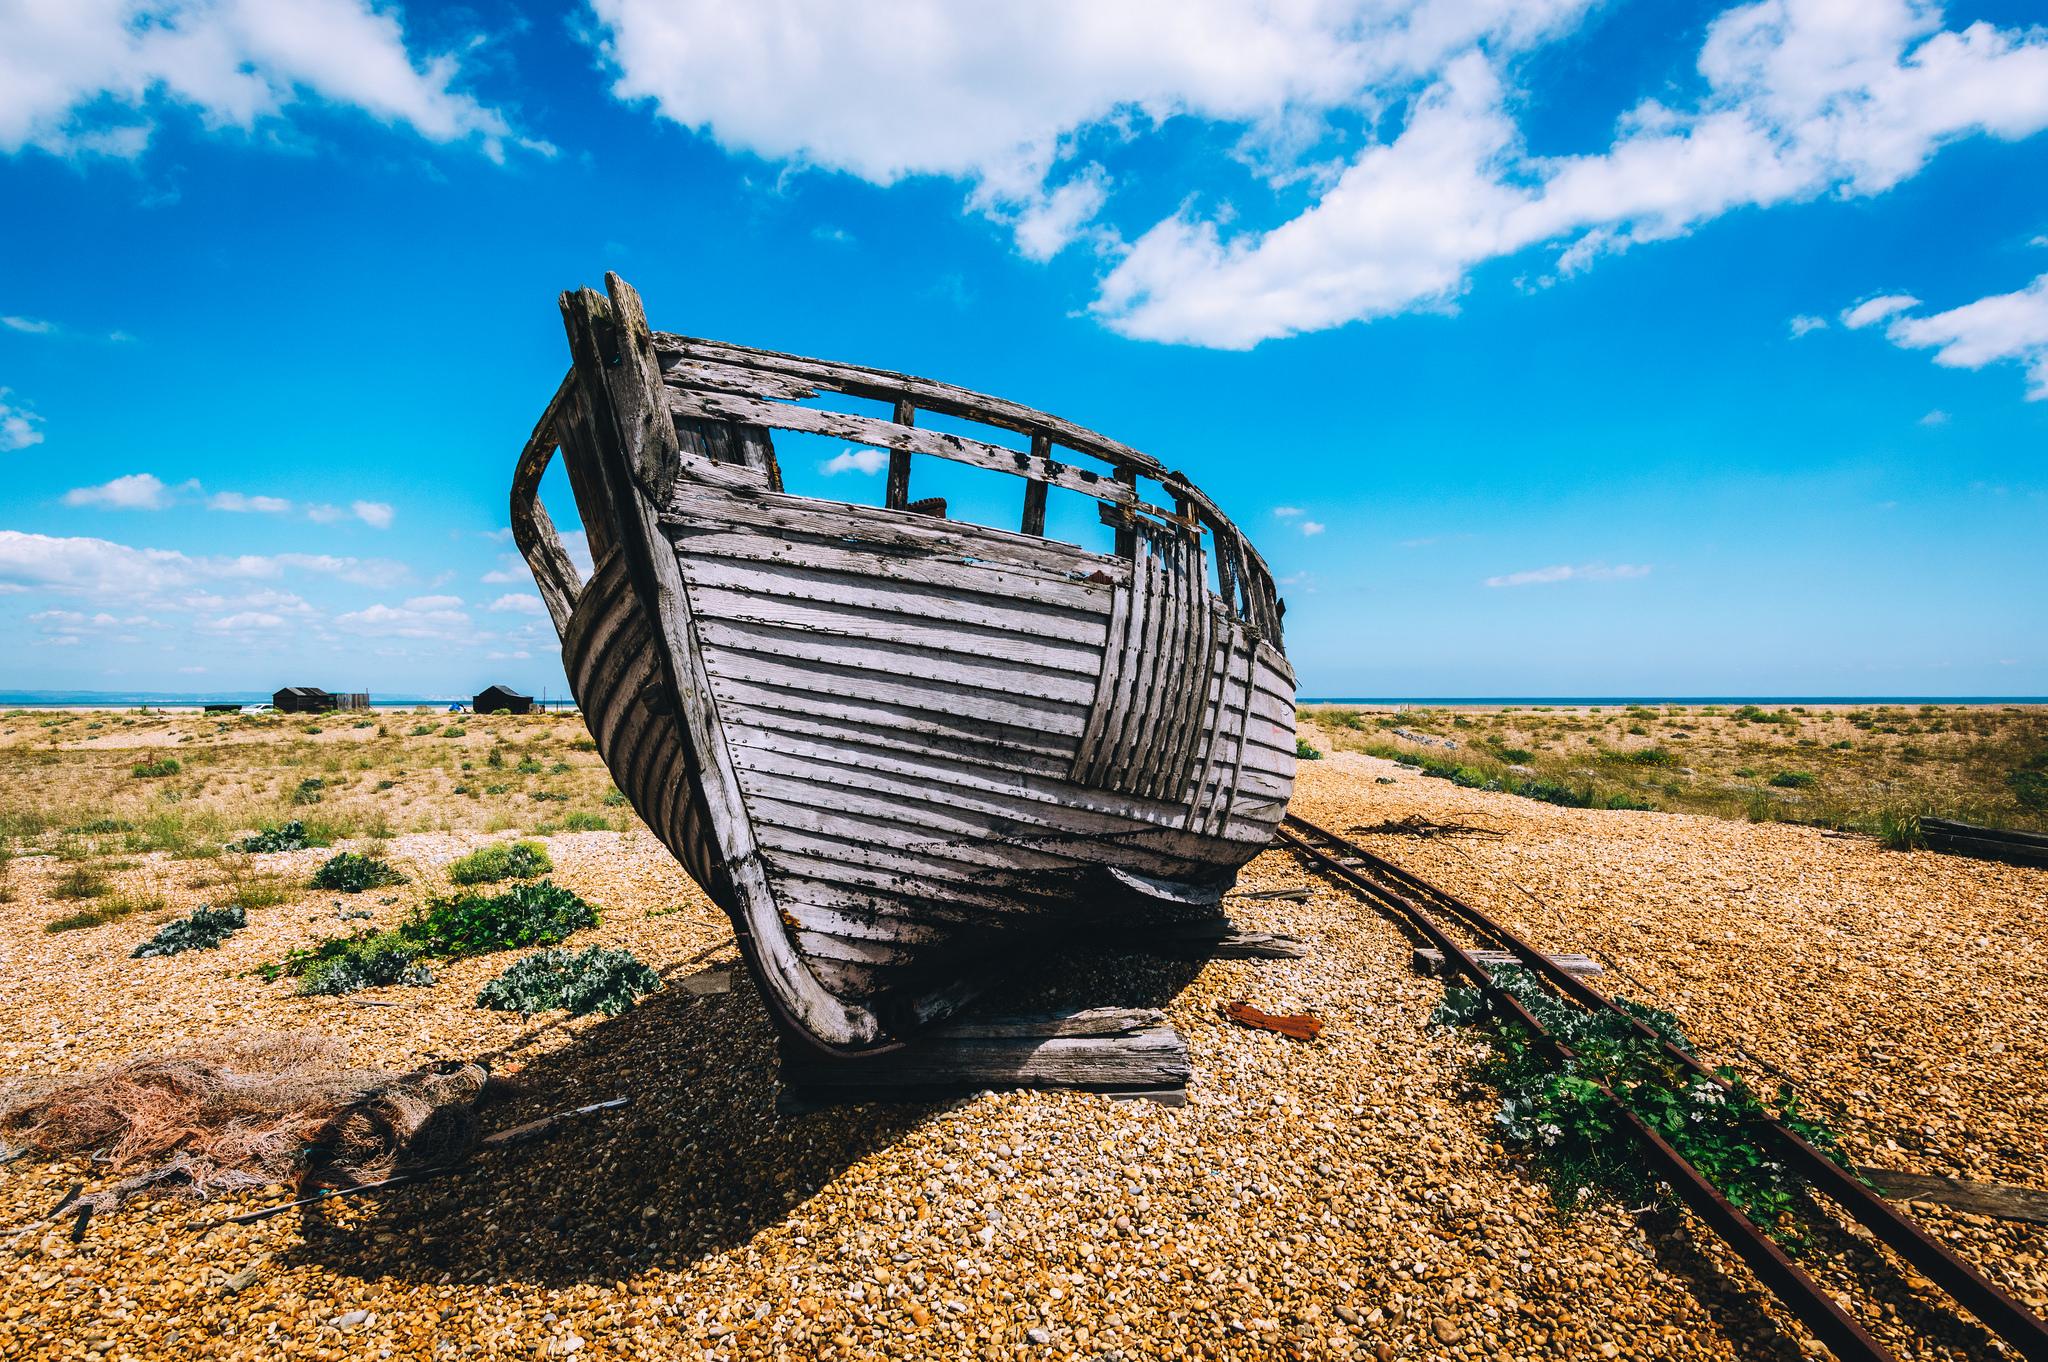 dungeness boat.jpg